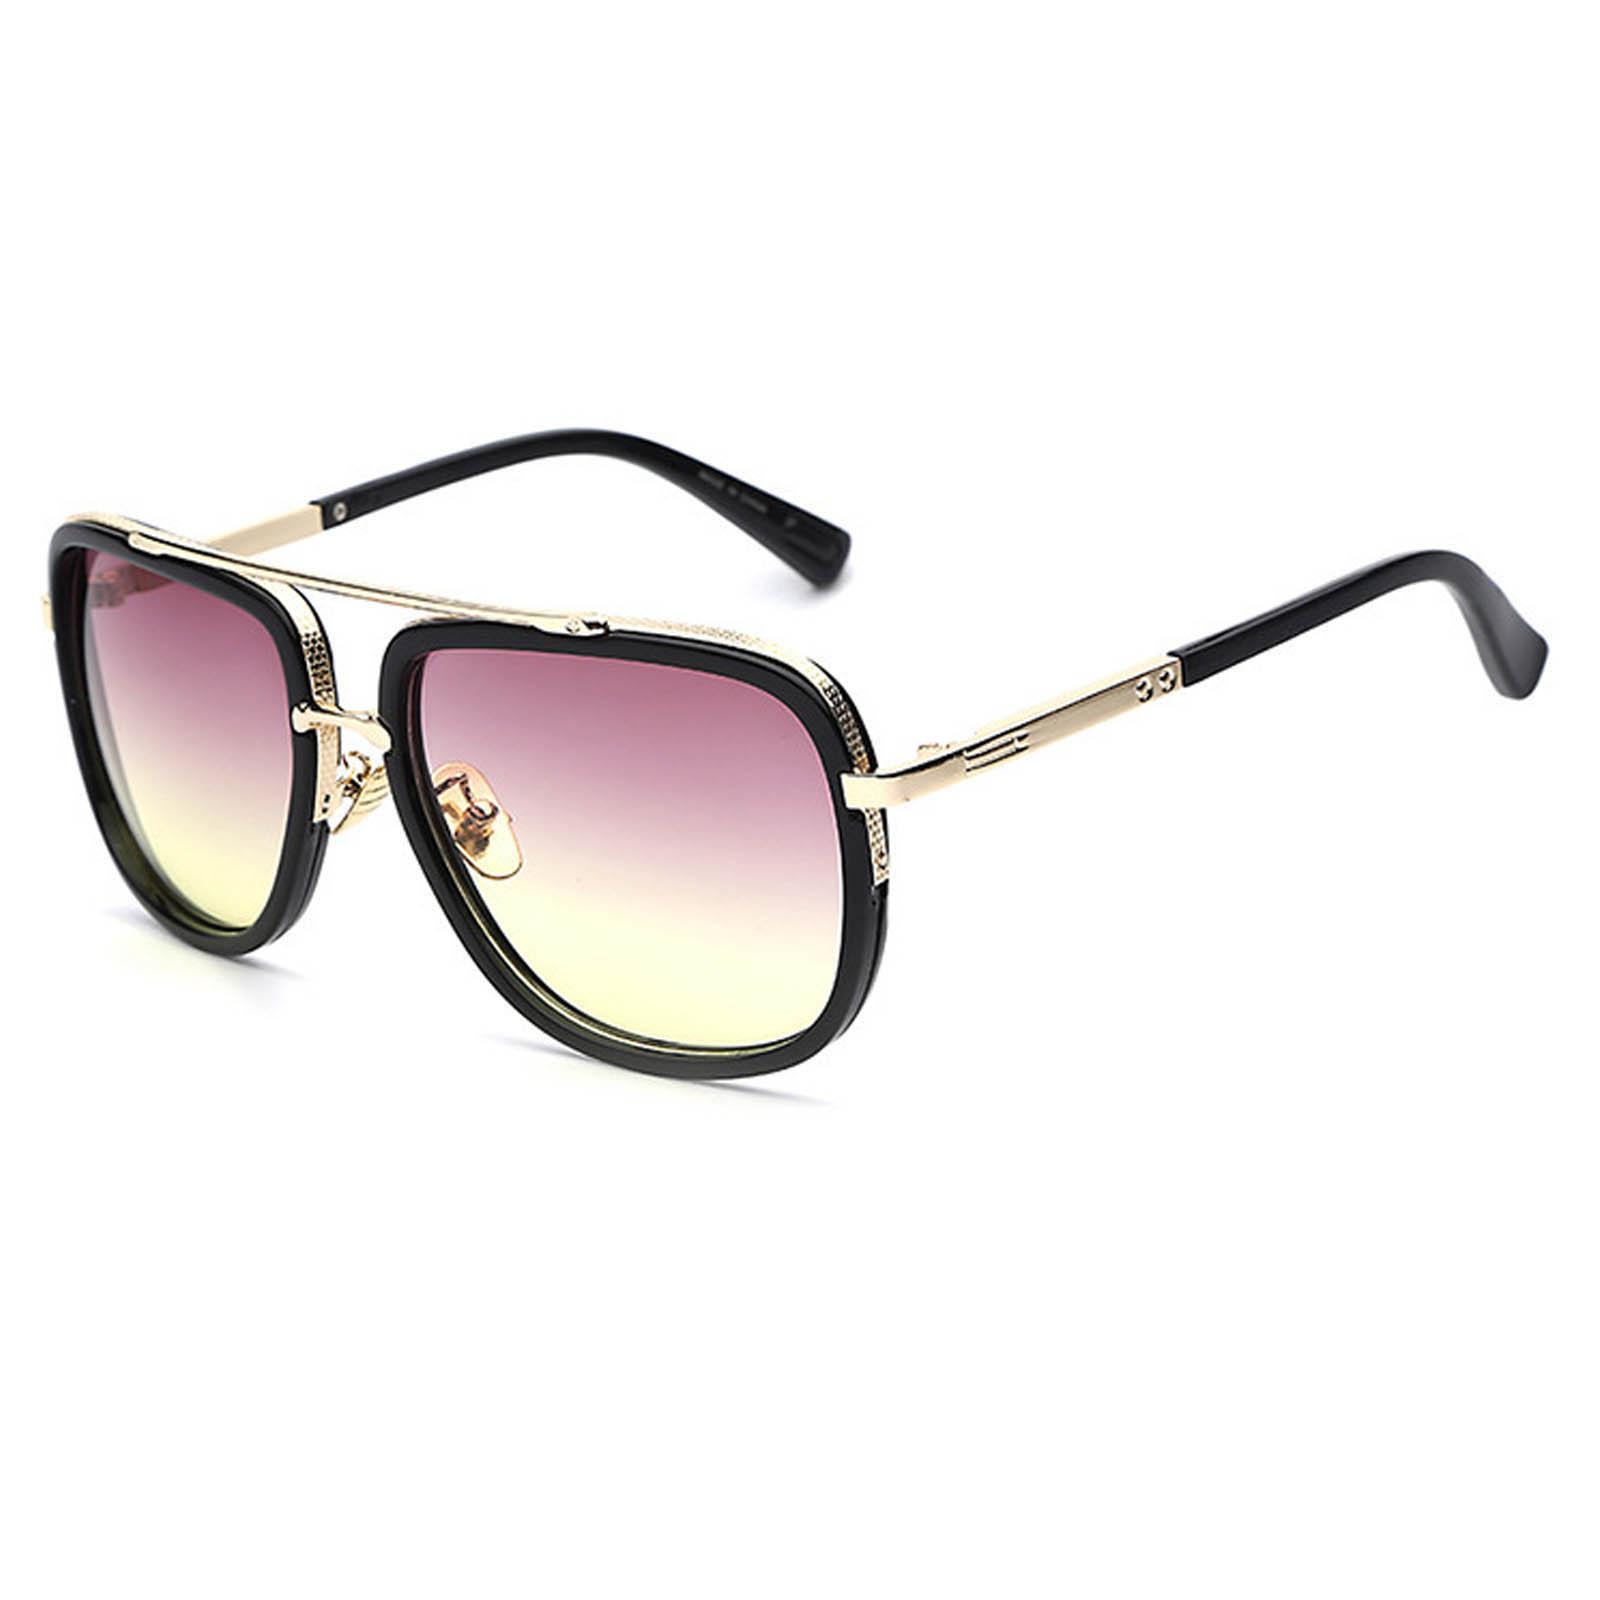 5f248c45d56 OWL ® 011 C5 Aviator Eyewear Sunglasses Women s Men s Metal Black Frame  Pink Lens One Pair